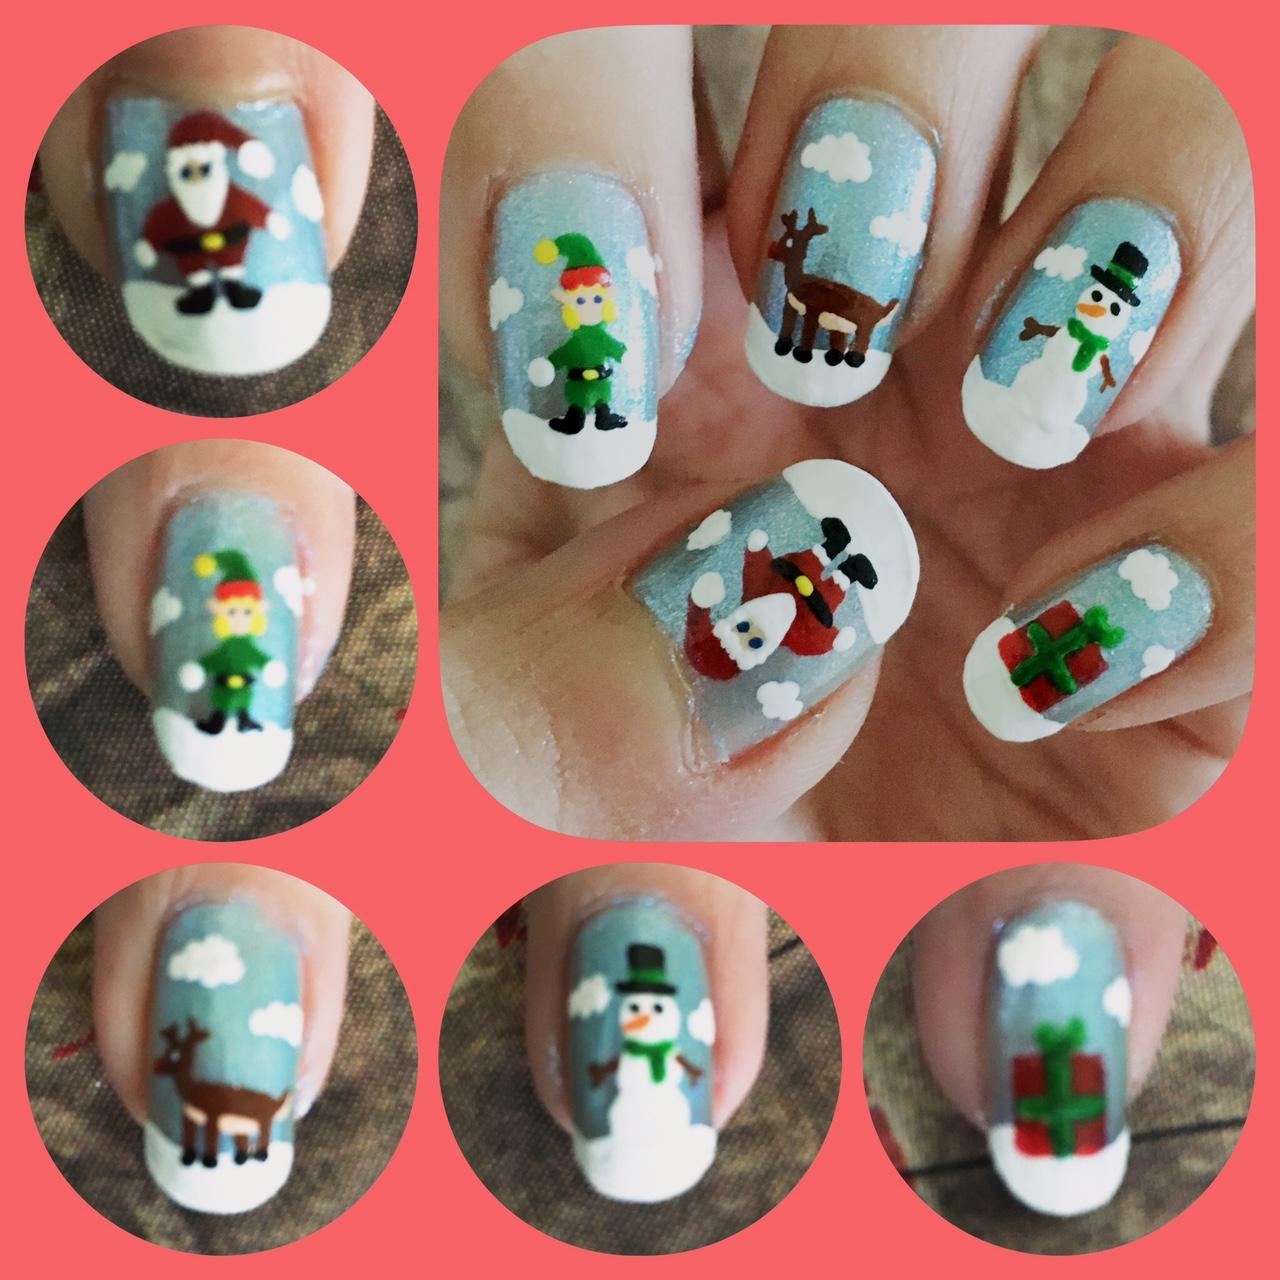 Christmas Nail Art 2016 Left by AzureMikari